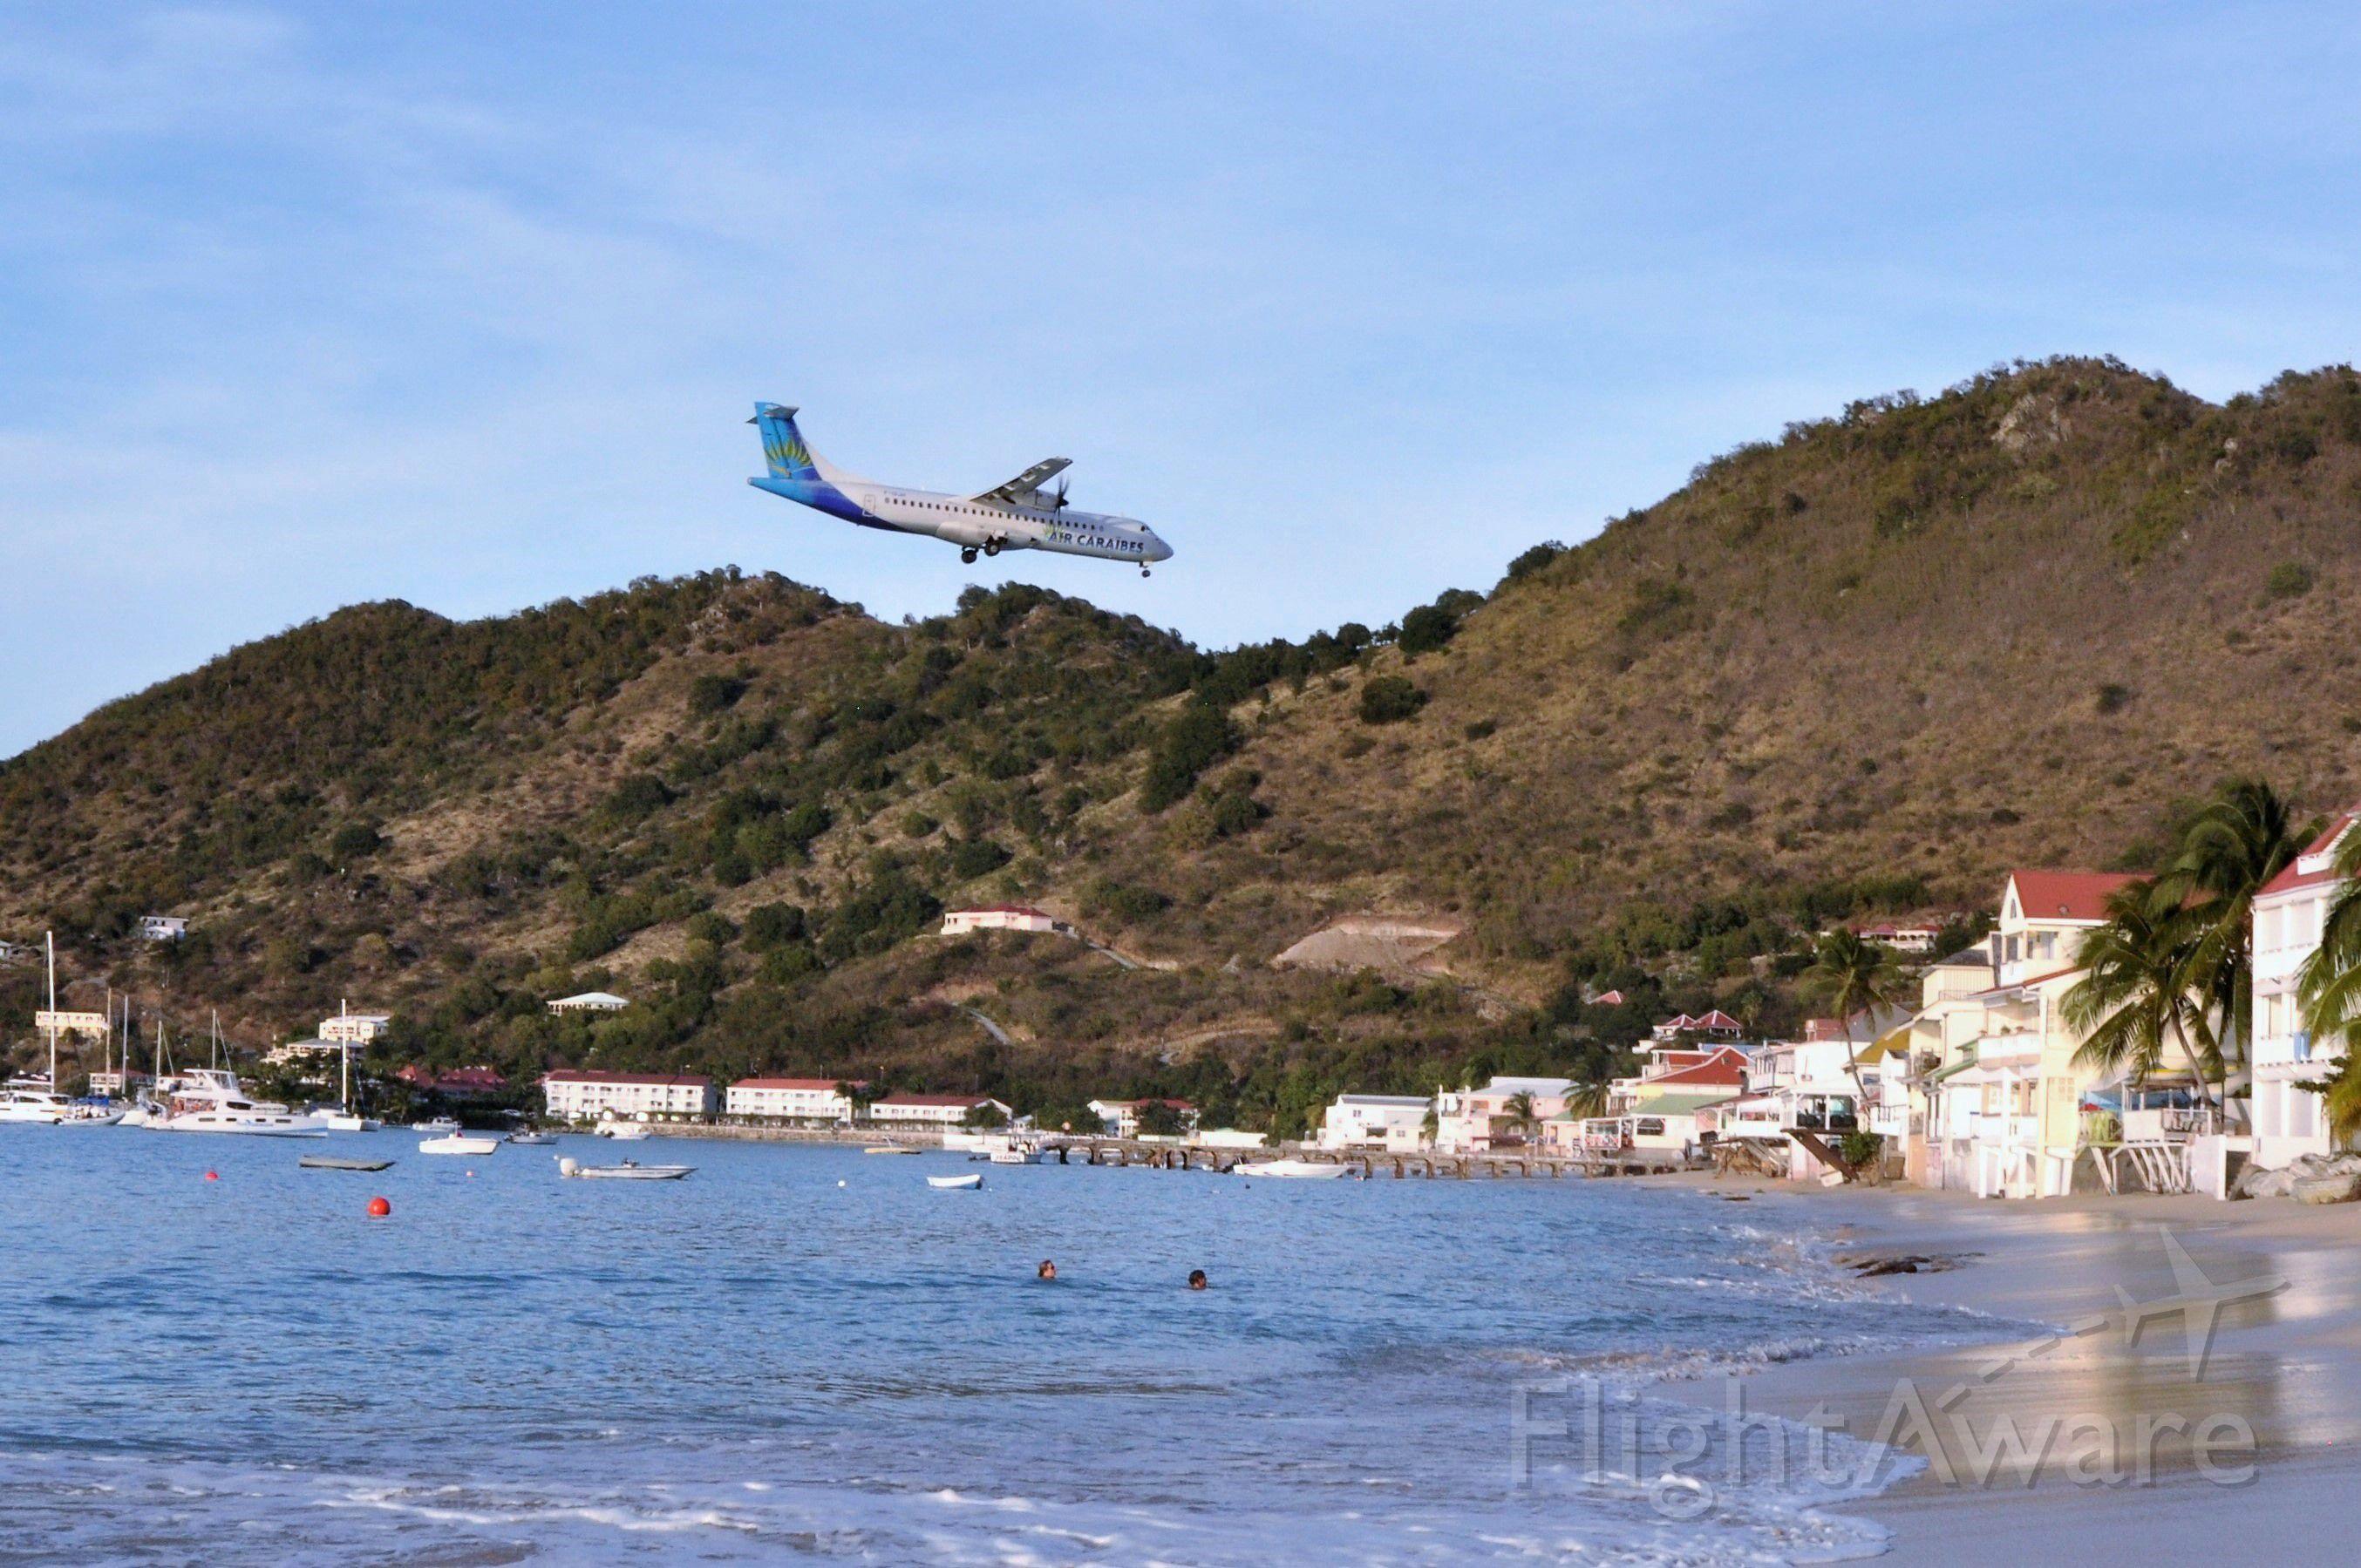 ATR ATR-72 — - Standing on the beach of Grand Case Village, St. Martin.